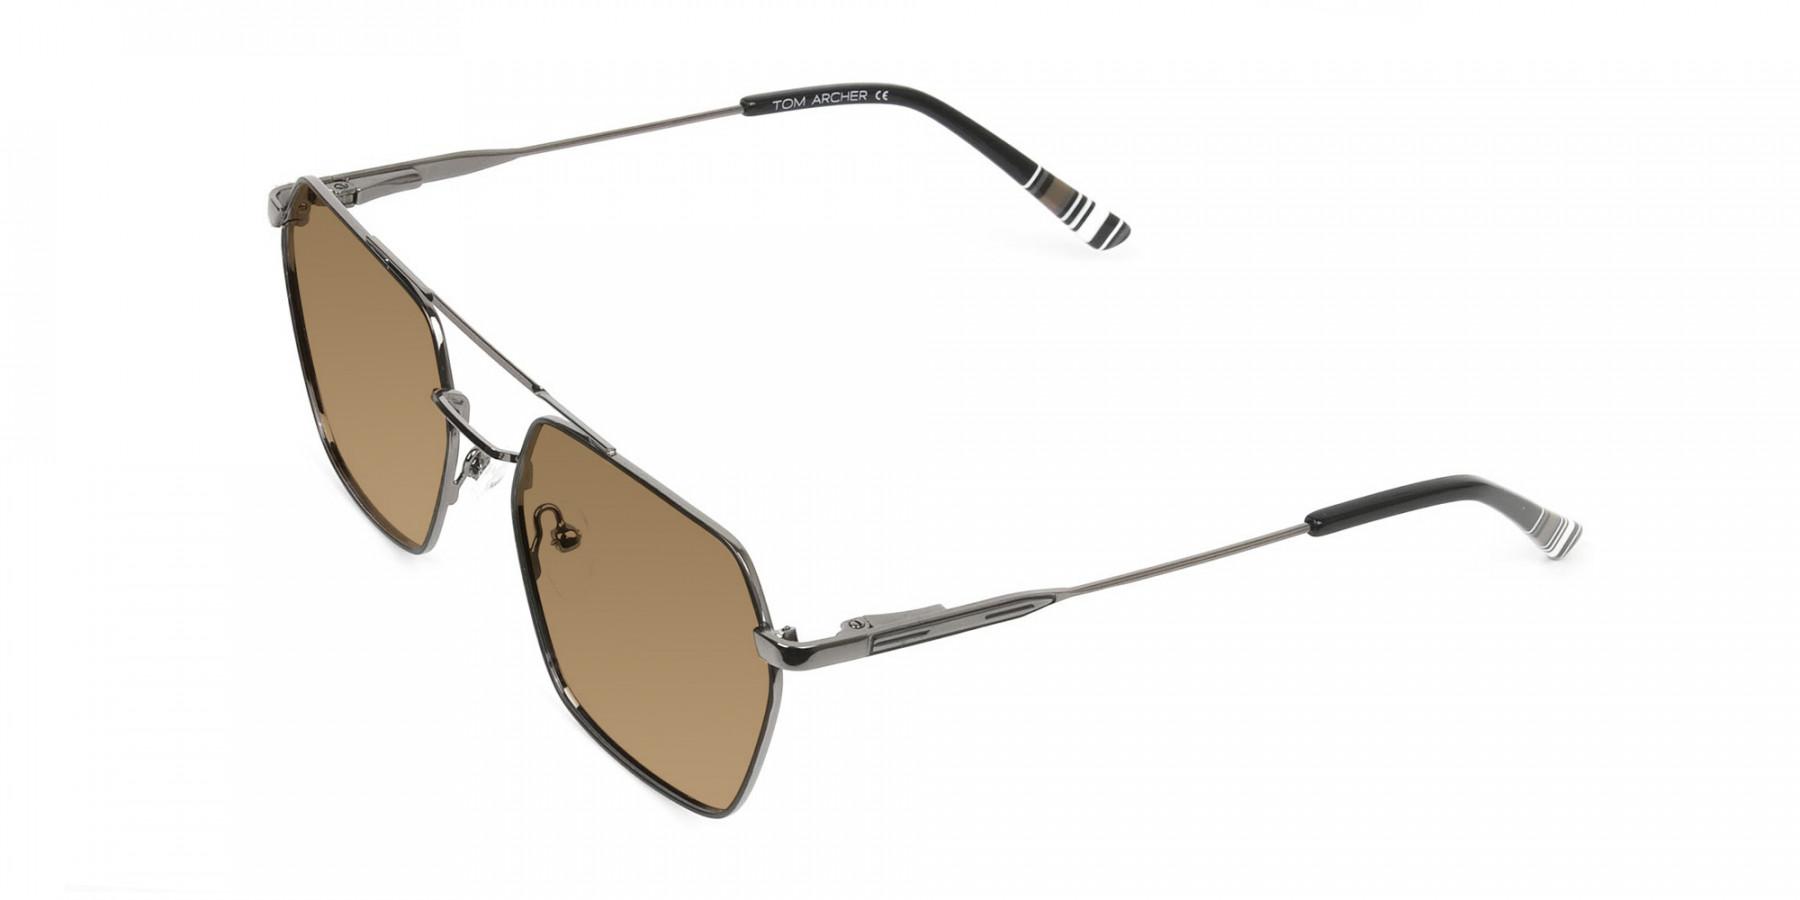 gunmetal-black-geometric-dark-brown-tinted-aviator-sunglasses-3